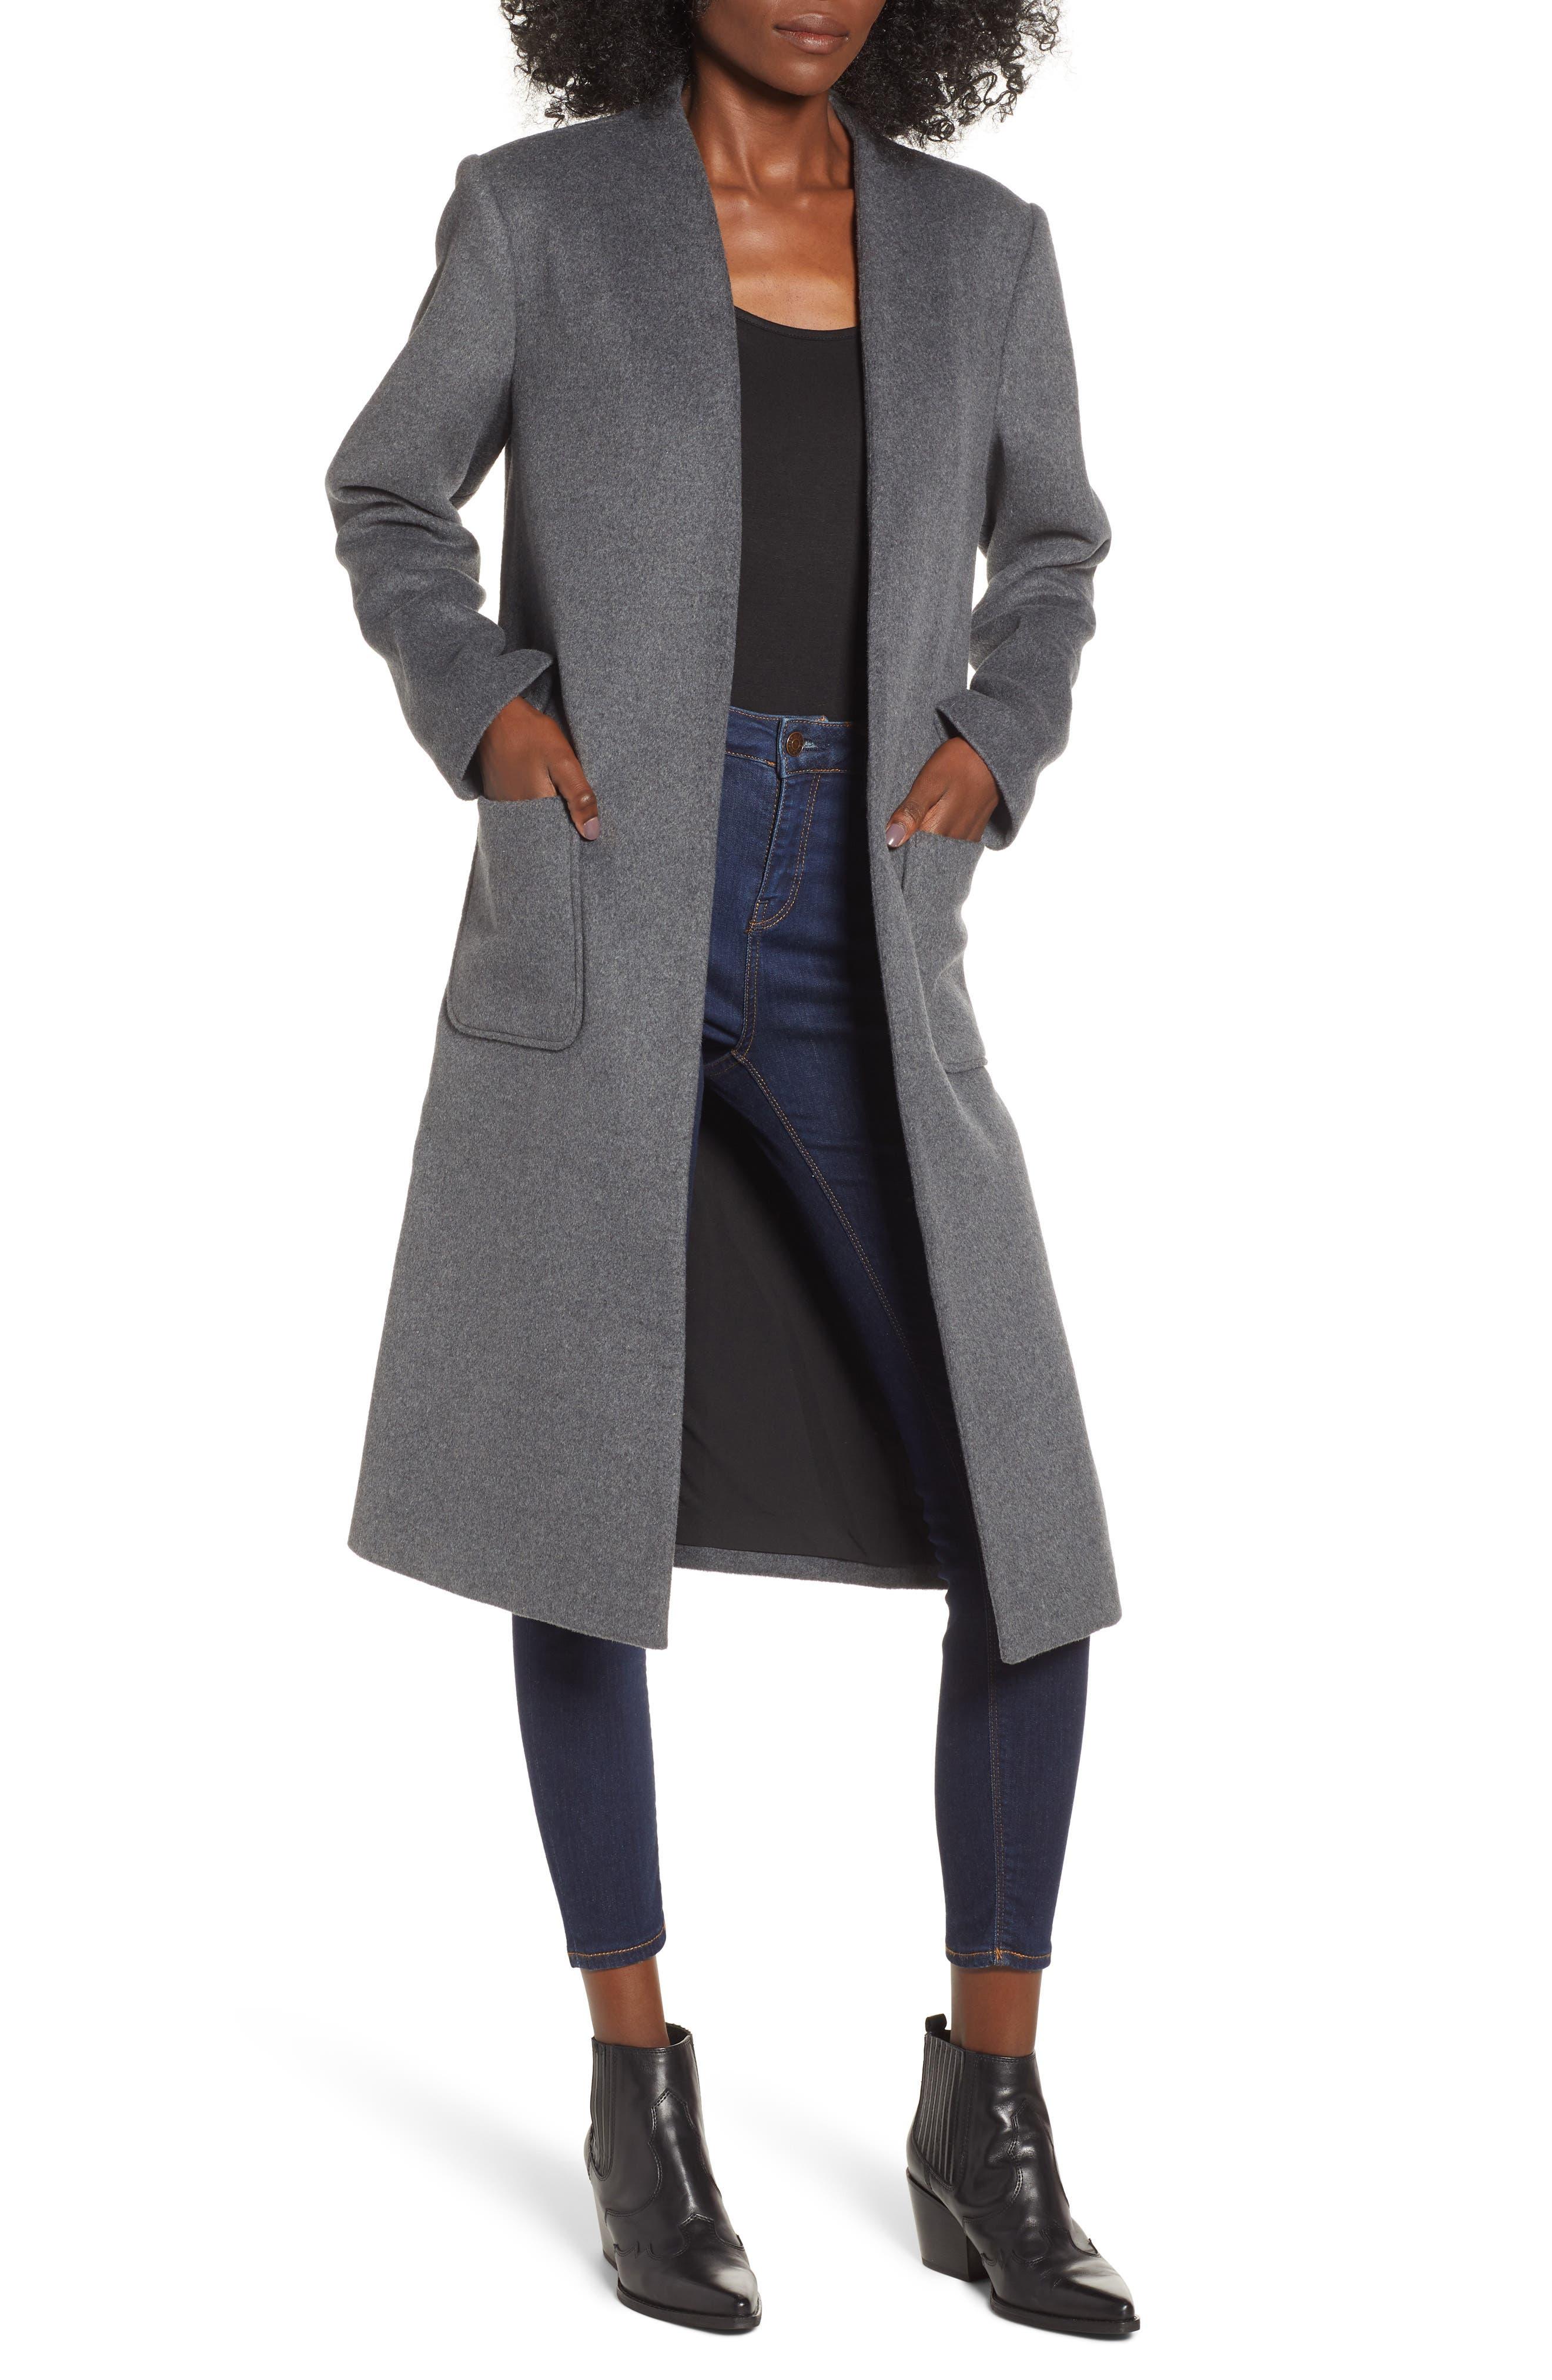 MURAL,                             Long Open Front Coat,                             Main thumbnail 1, color,                             CHARCOAL GREY